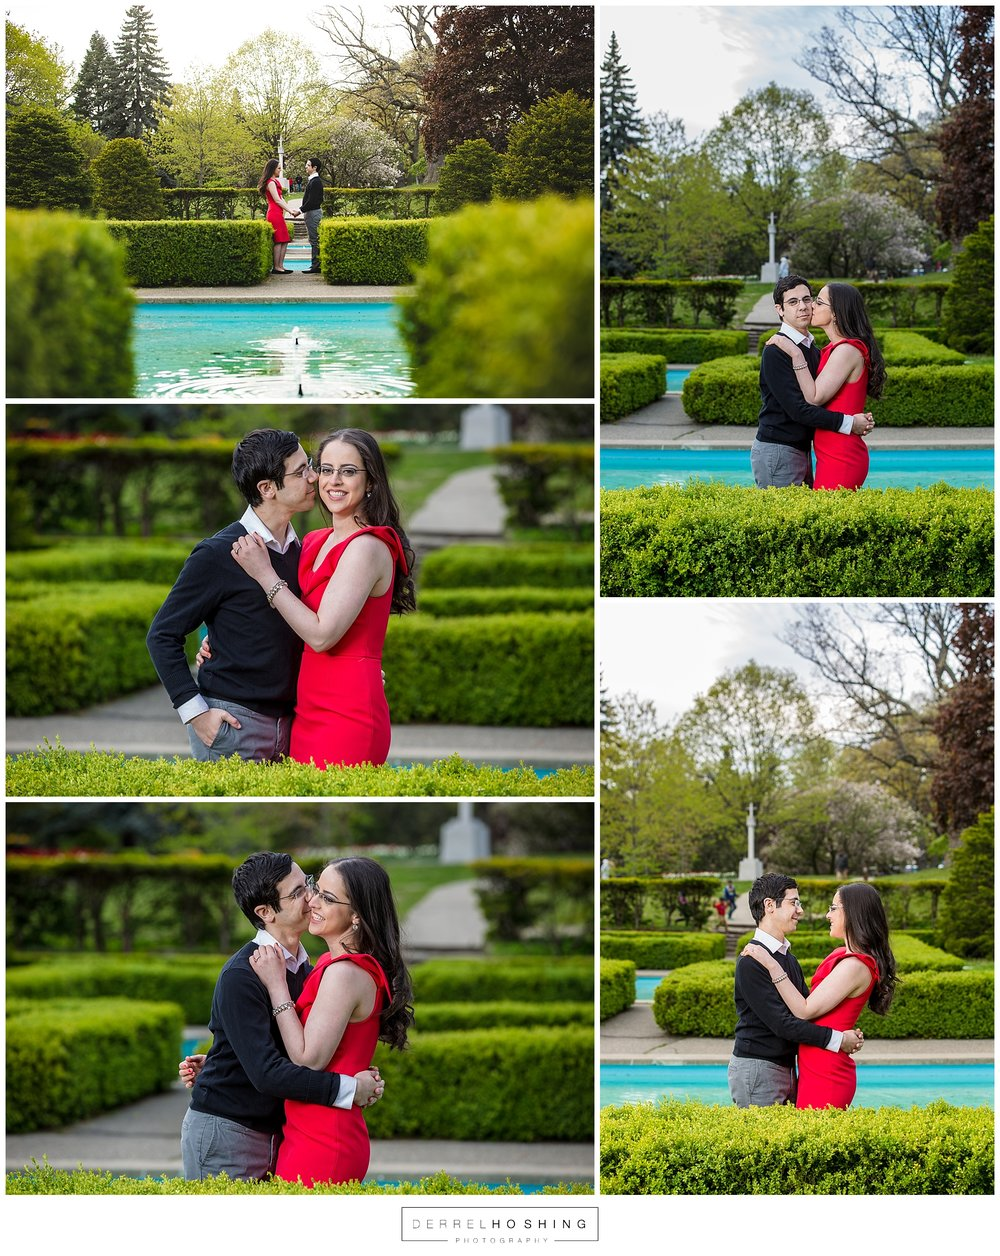 High-Park-Toronto-Ontario-Cherry-Blossoms-Engagement-Shoot-0013.jpg